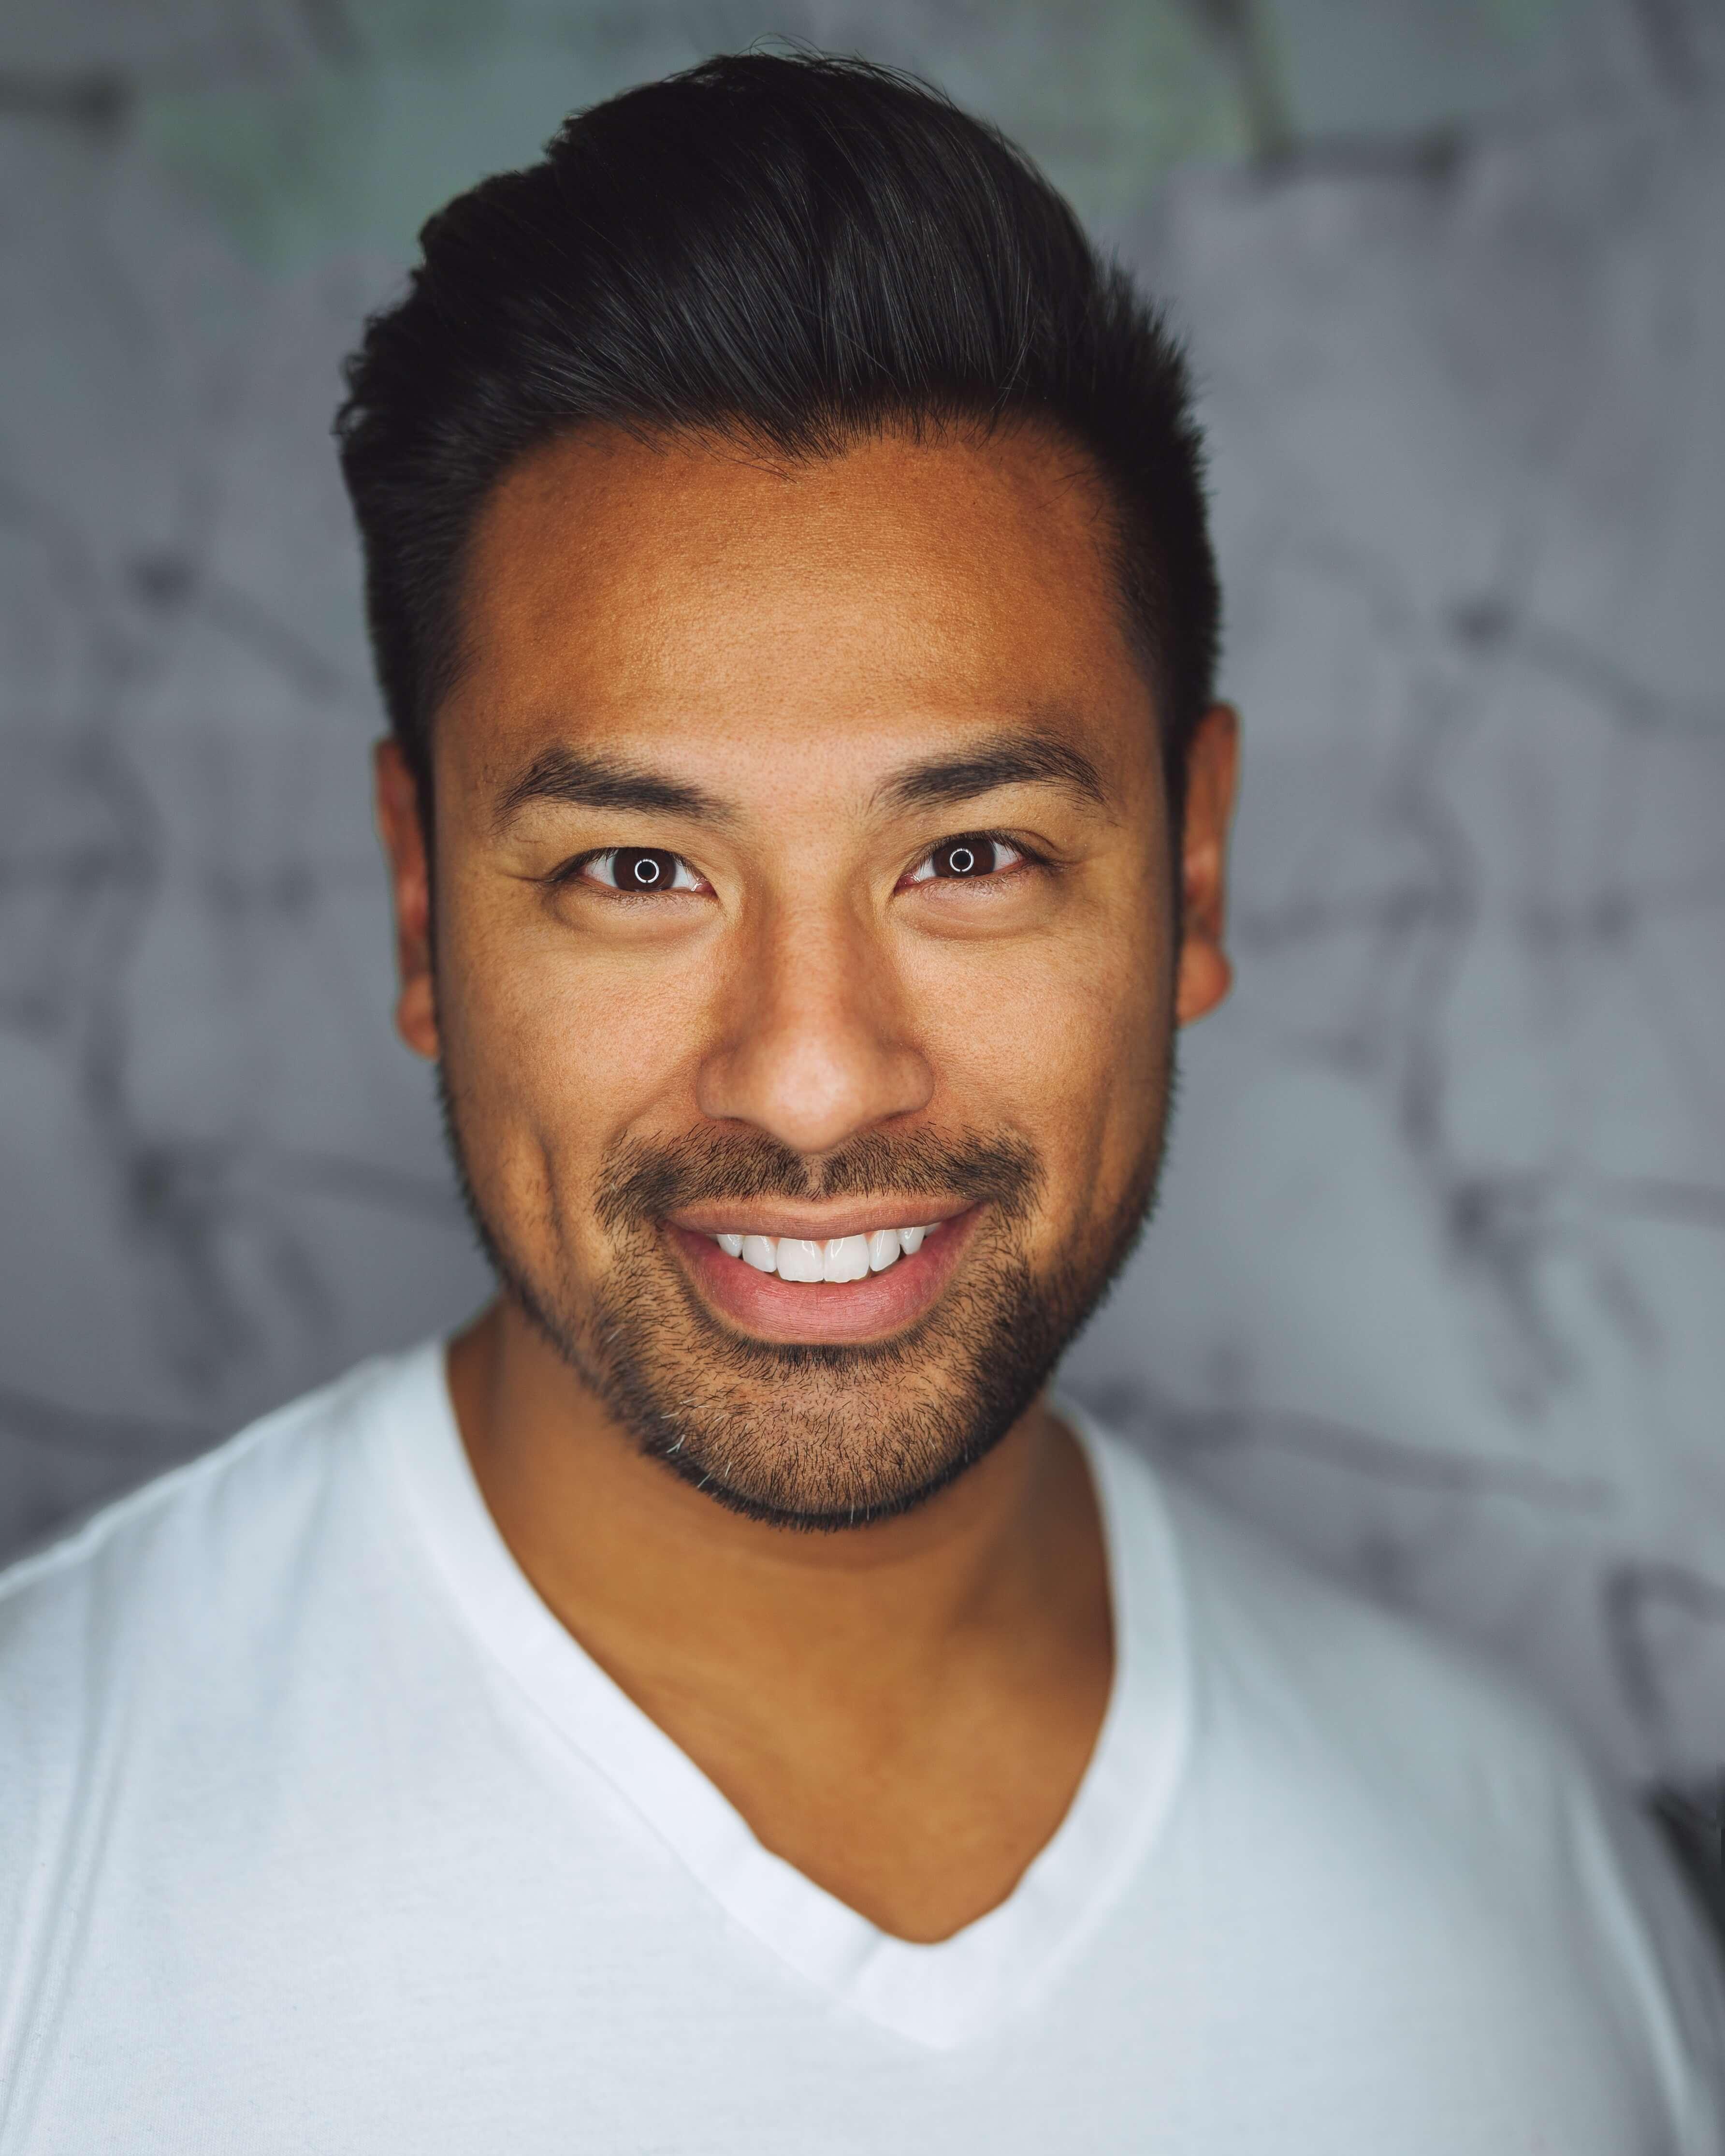 mężczyzna stomatolog portret